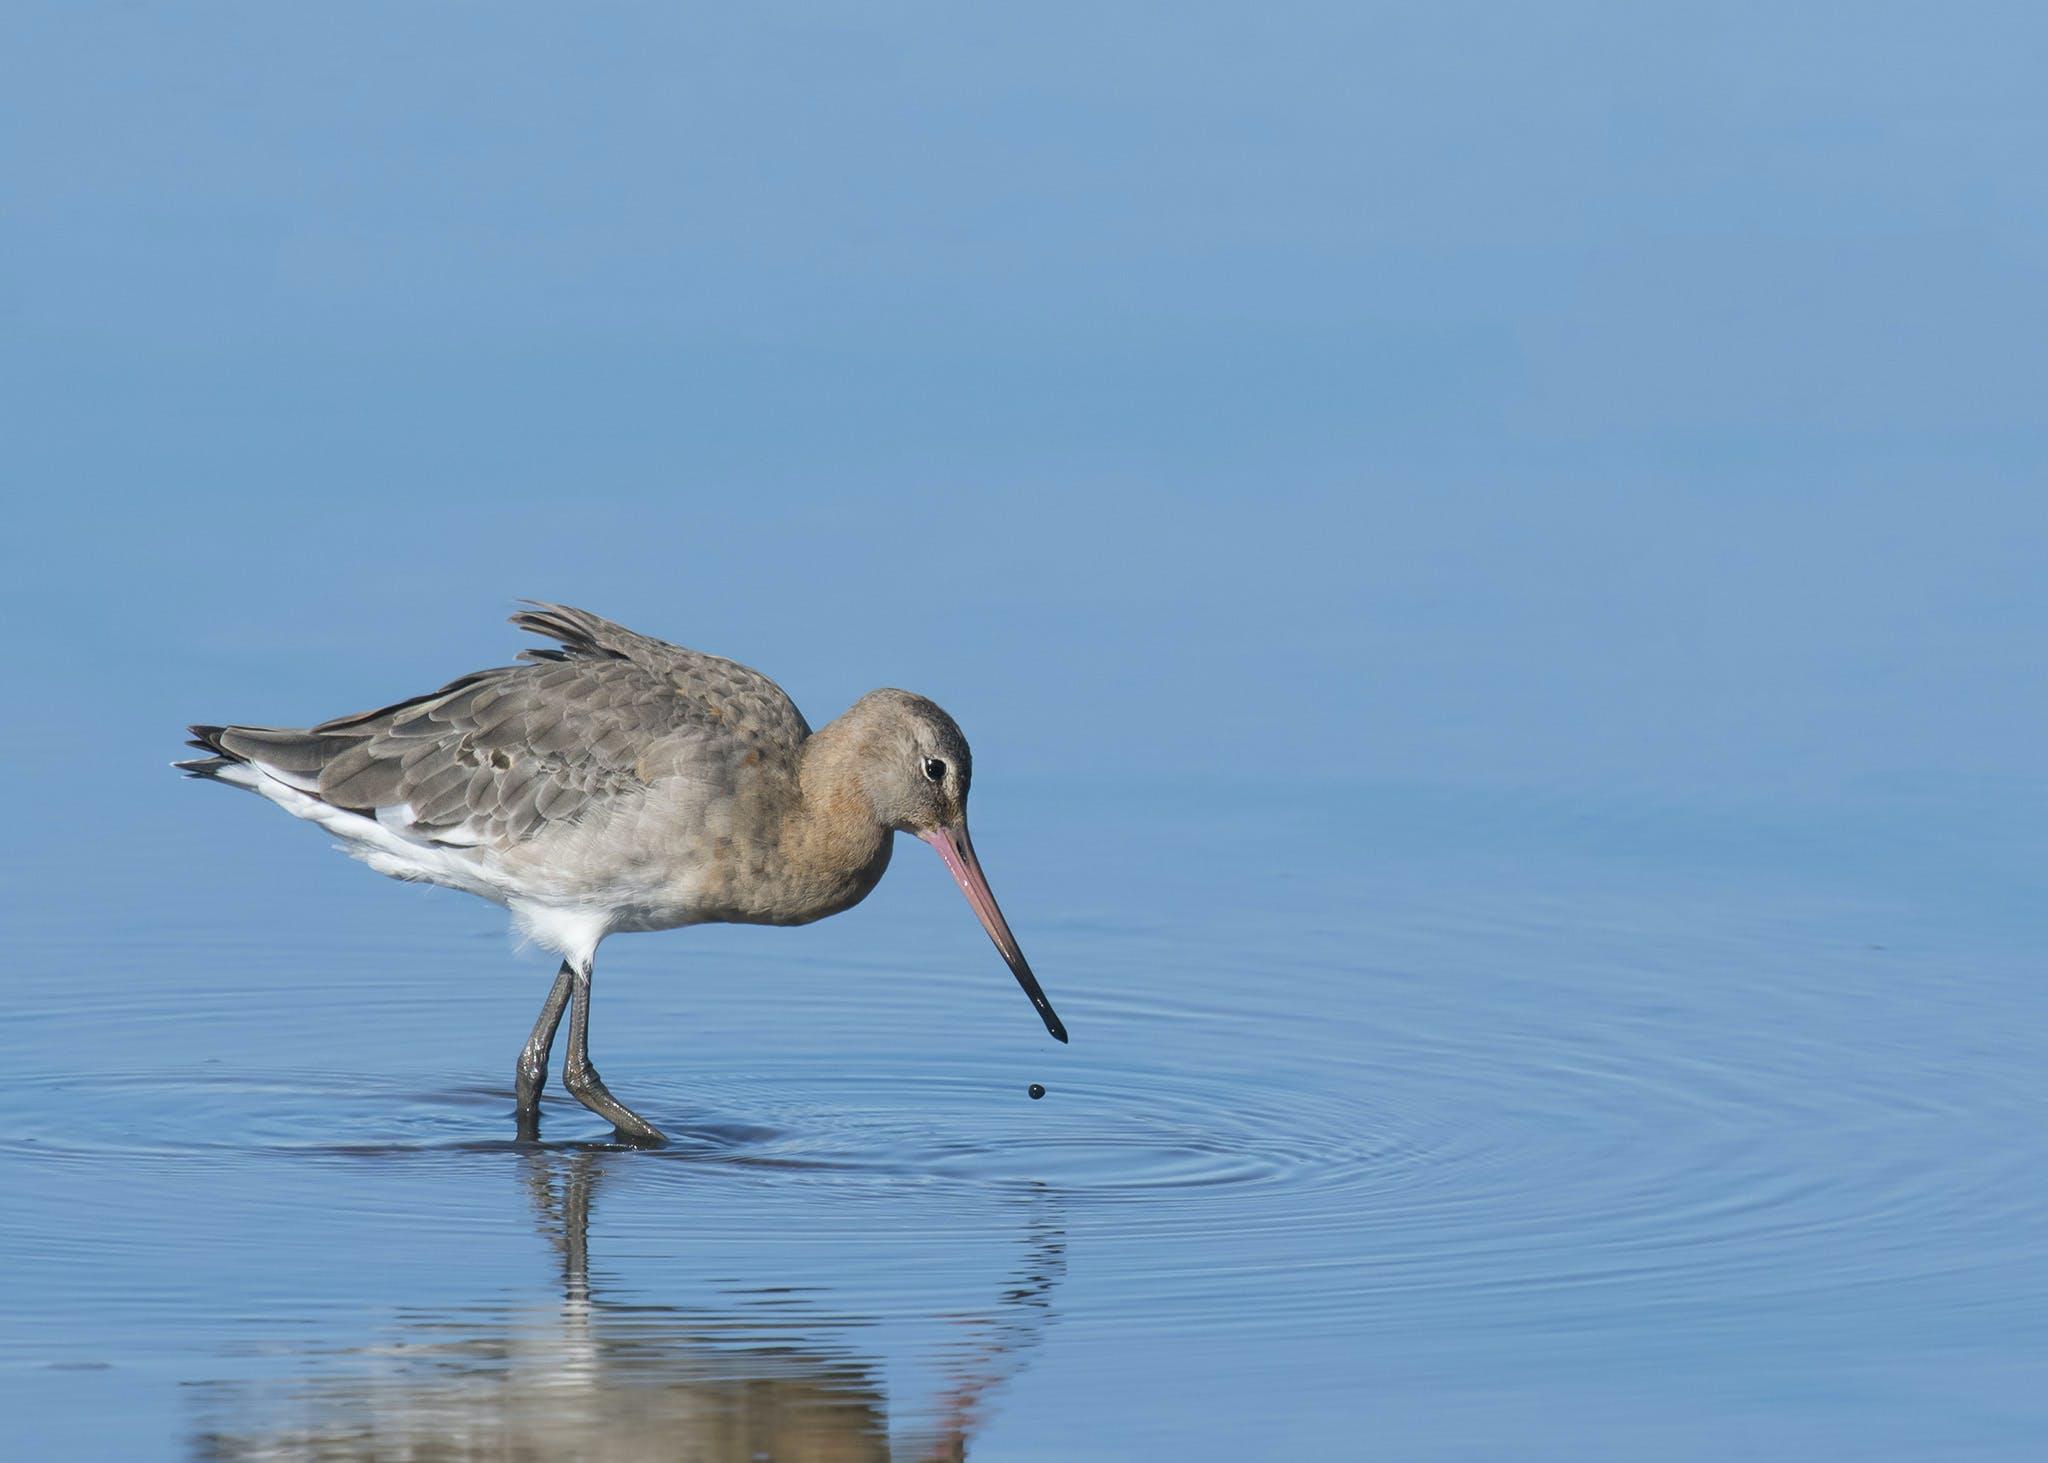 Free stock photo of bird, blue water, ripples, wader